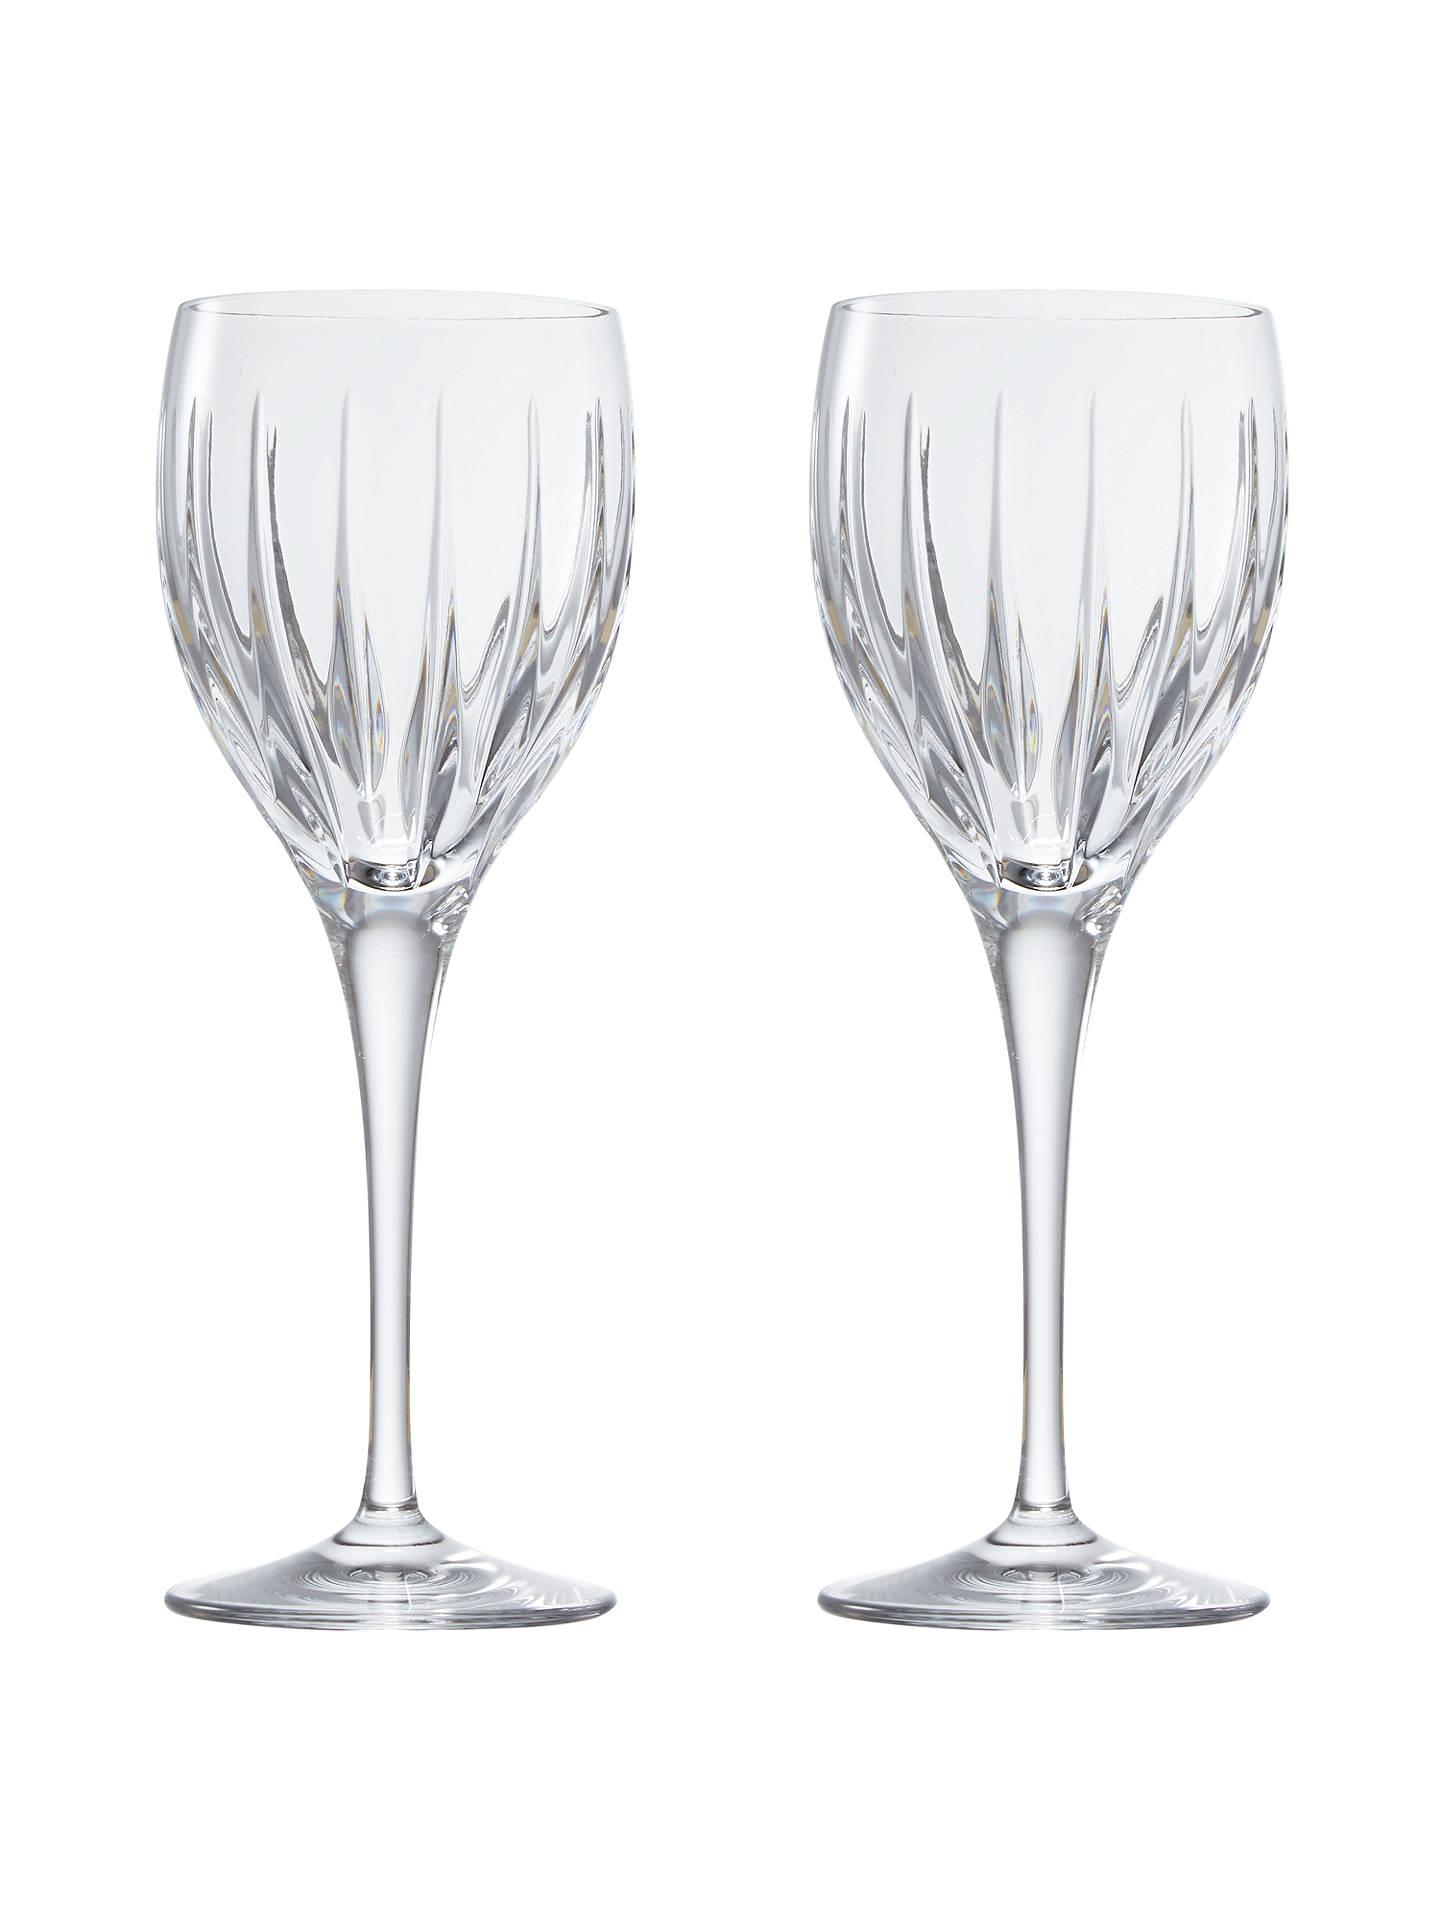 john lewis glacier cut lead crystal wine glasses 790ml. Black Bedroom Furniture Sets. Home Design Ideas